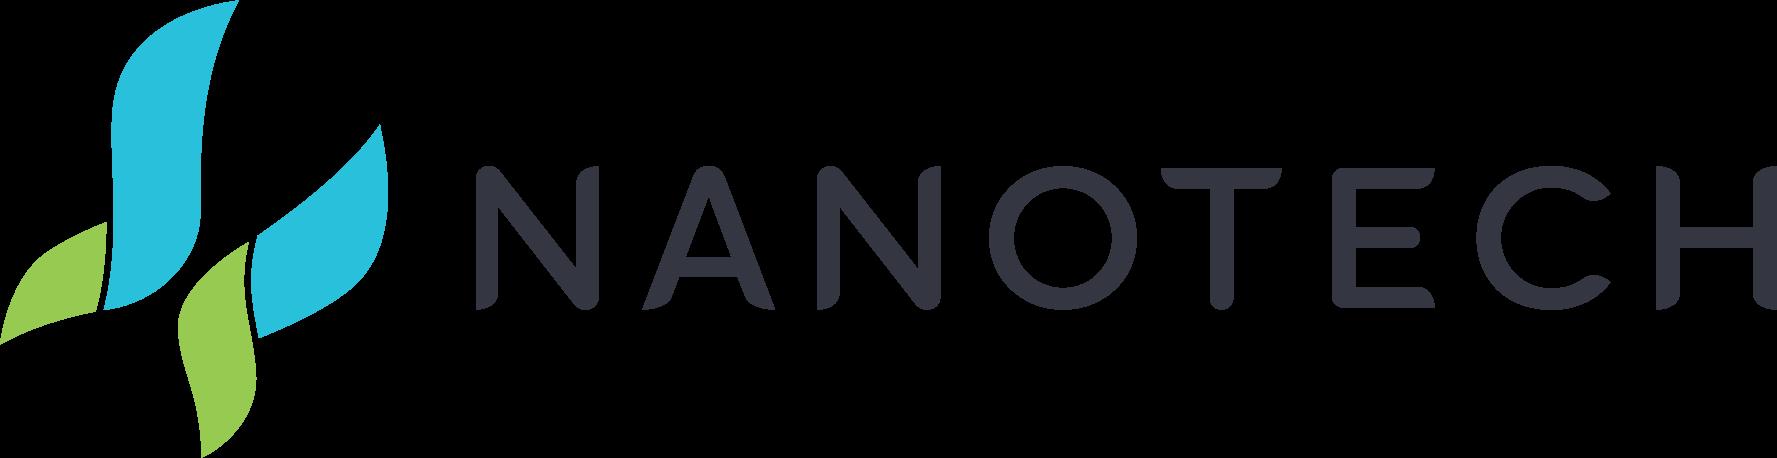 Nanotech Adds Technology Veteran Andrew Green as EVP, Product